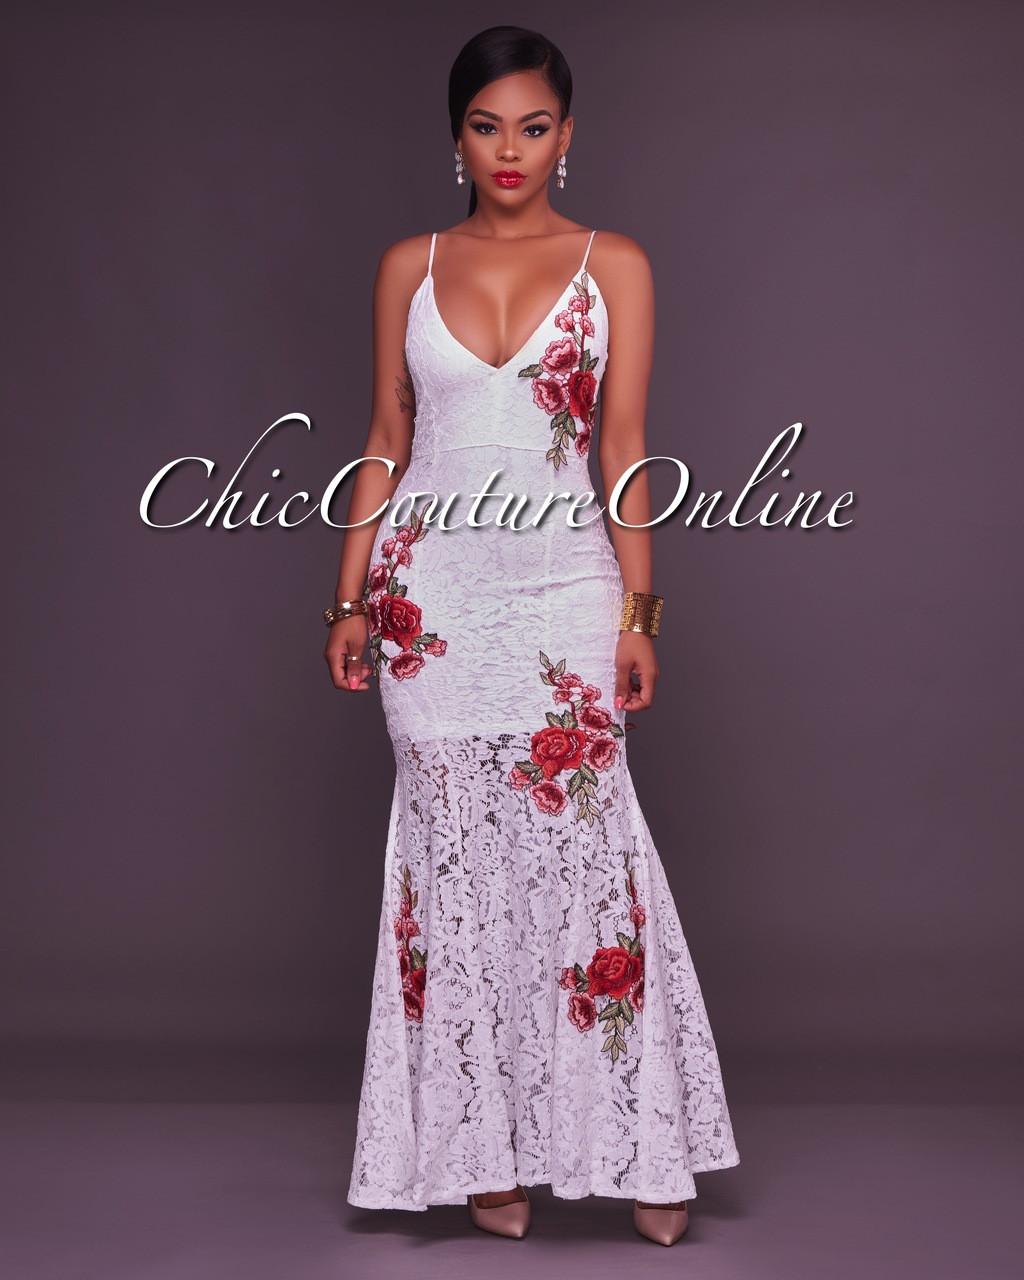 f7661e6c4d51e Queta White Lace Dress Red Floral Embroidery Mermaid Dress